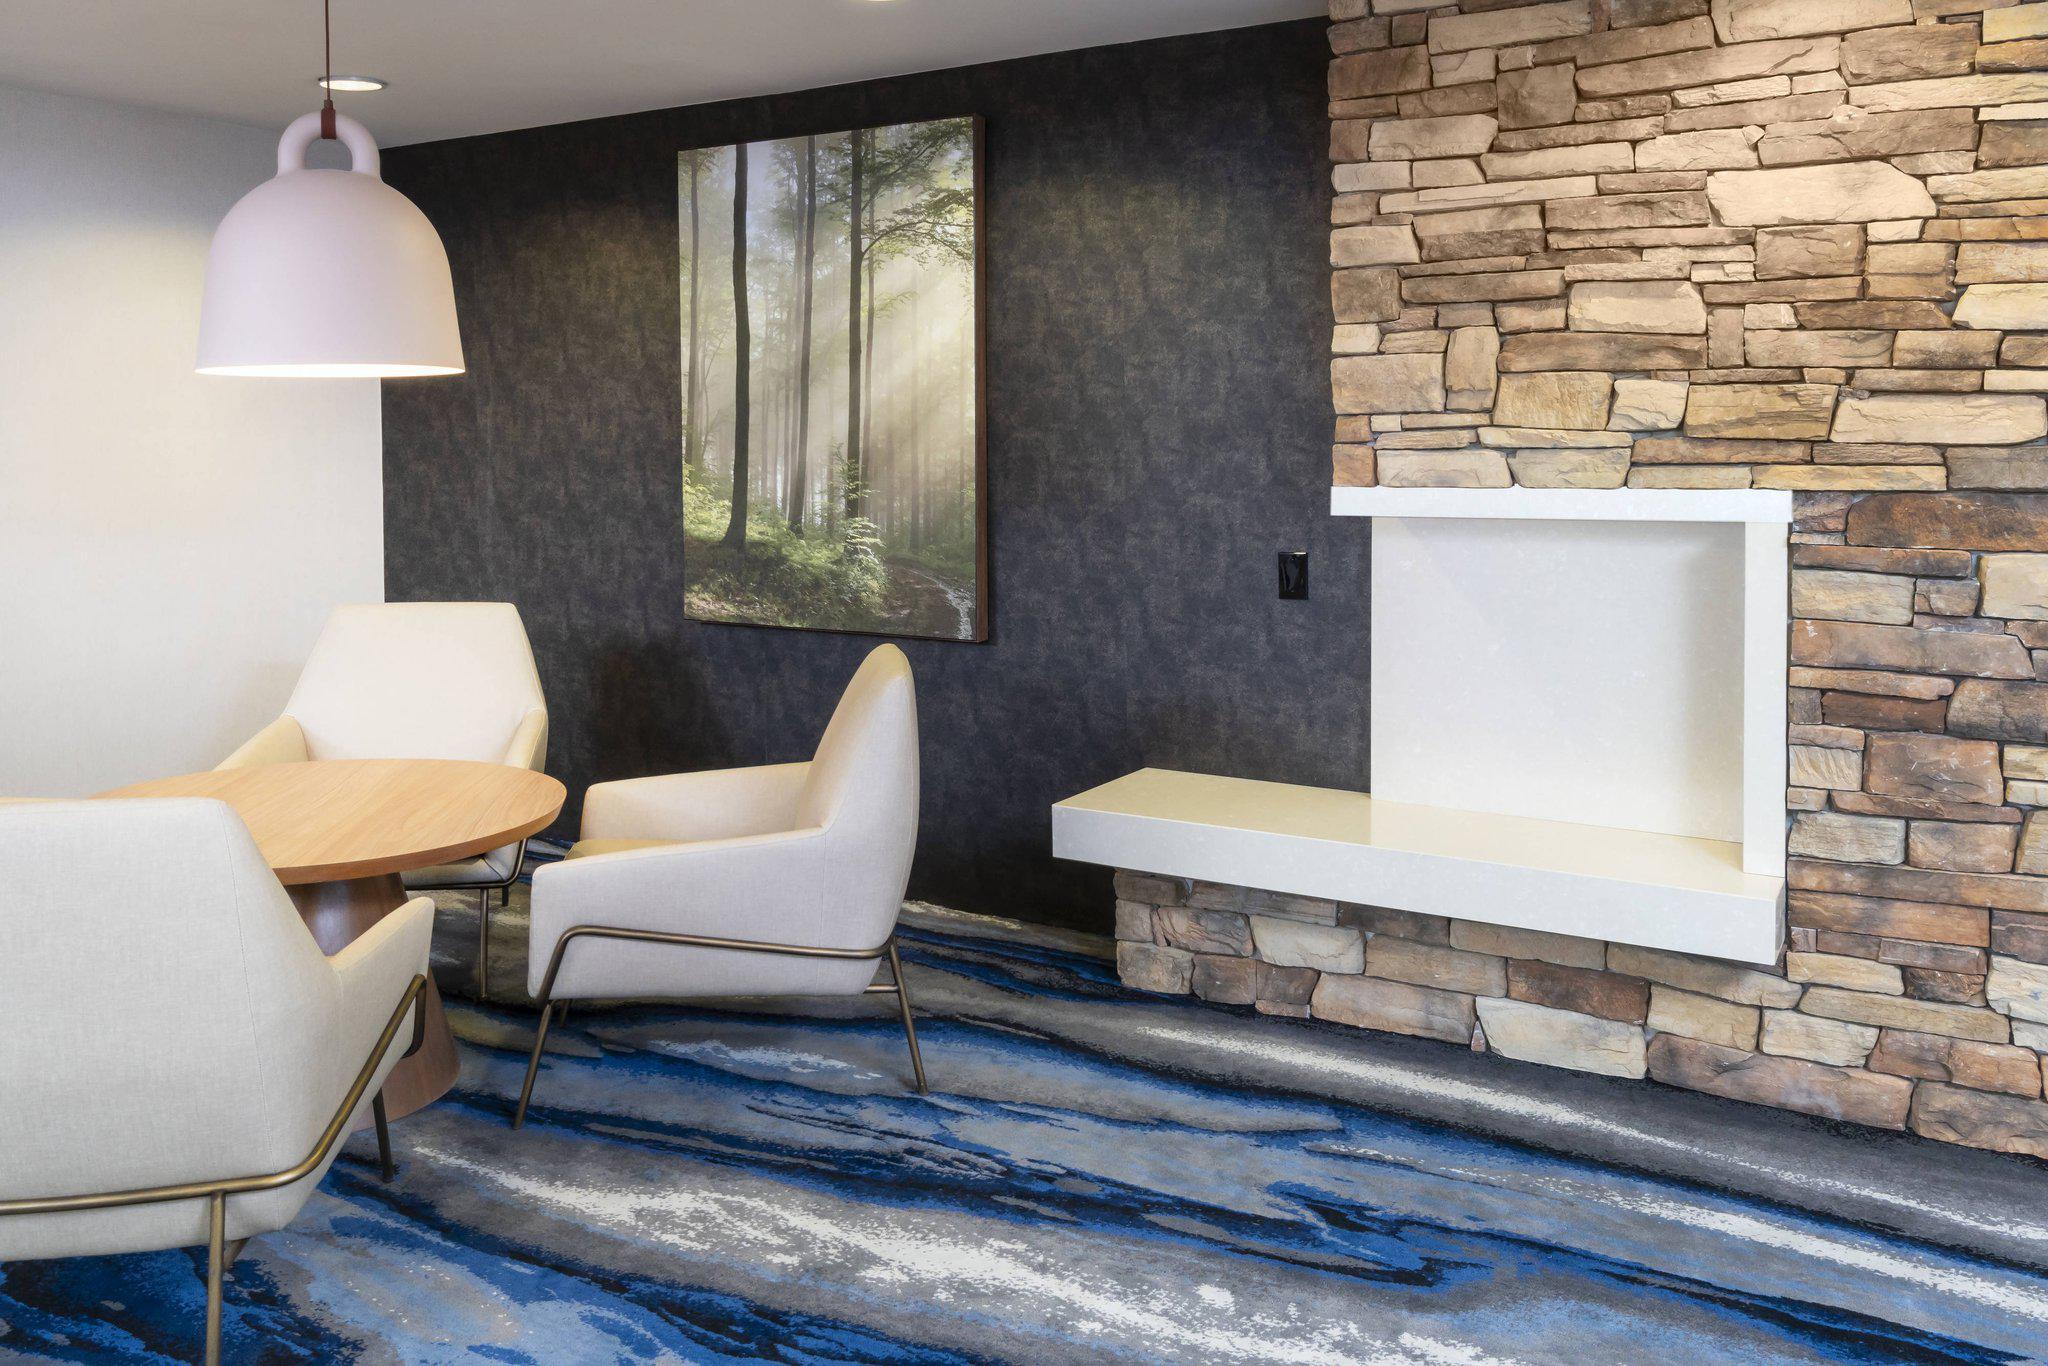 Fairfield Inn & Suites by Marriott Bend Downtown